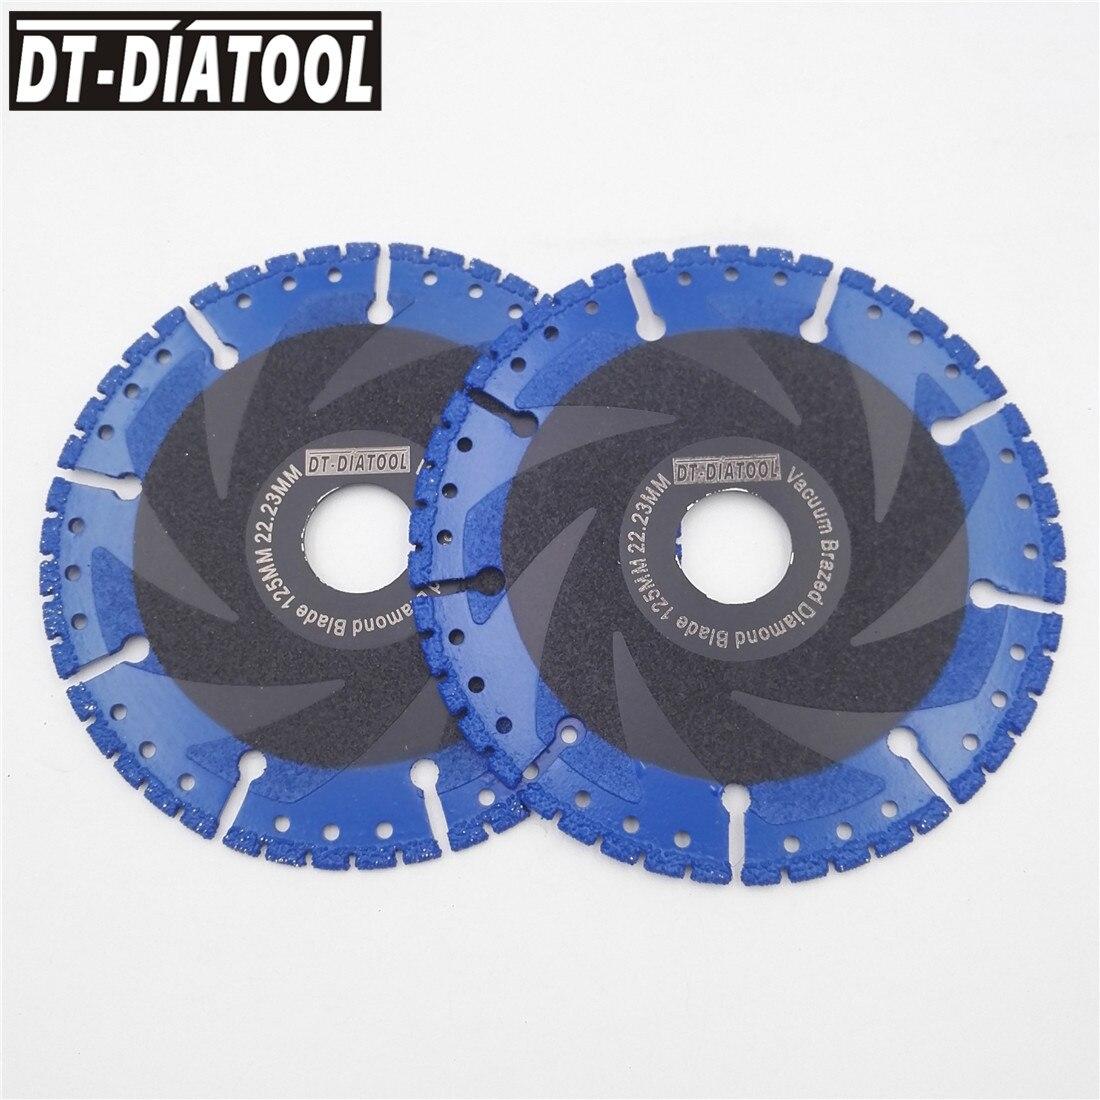 DT DIATOOL 2pcs 5 Vacuum Brazed Diamond cutting Disc all Purpose saw blade 125mm Rescue Diamond